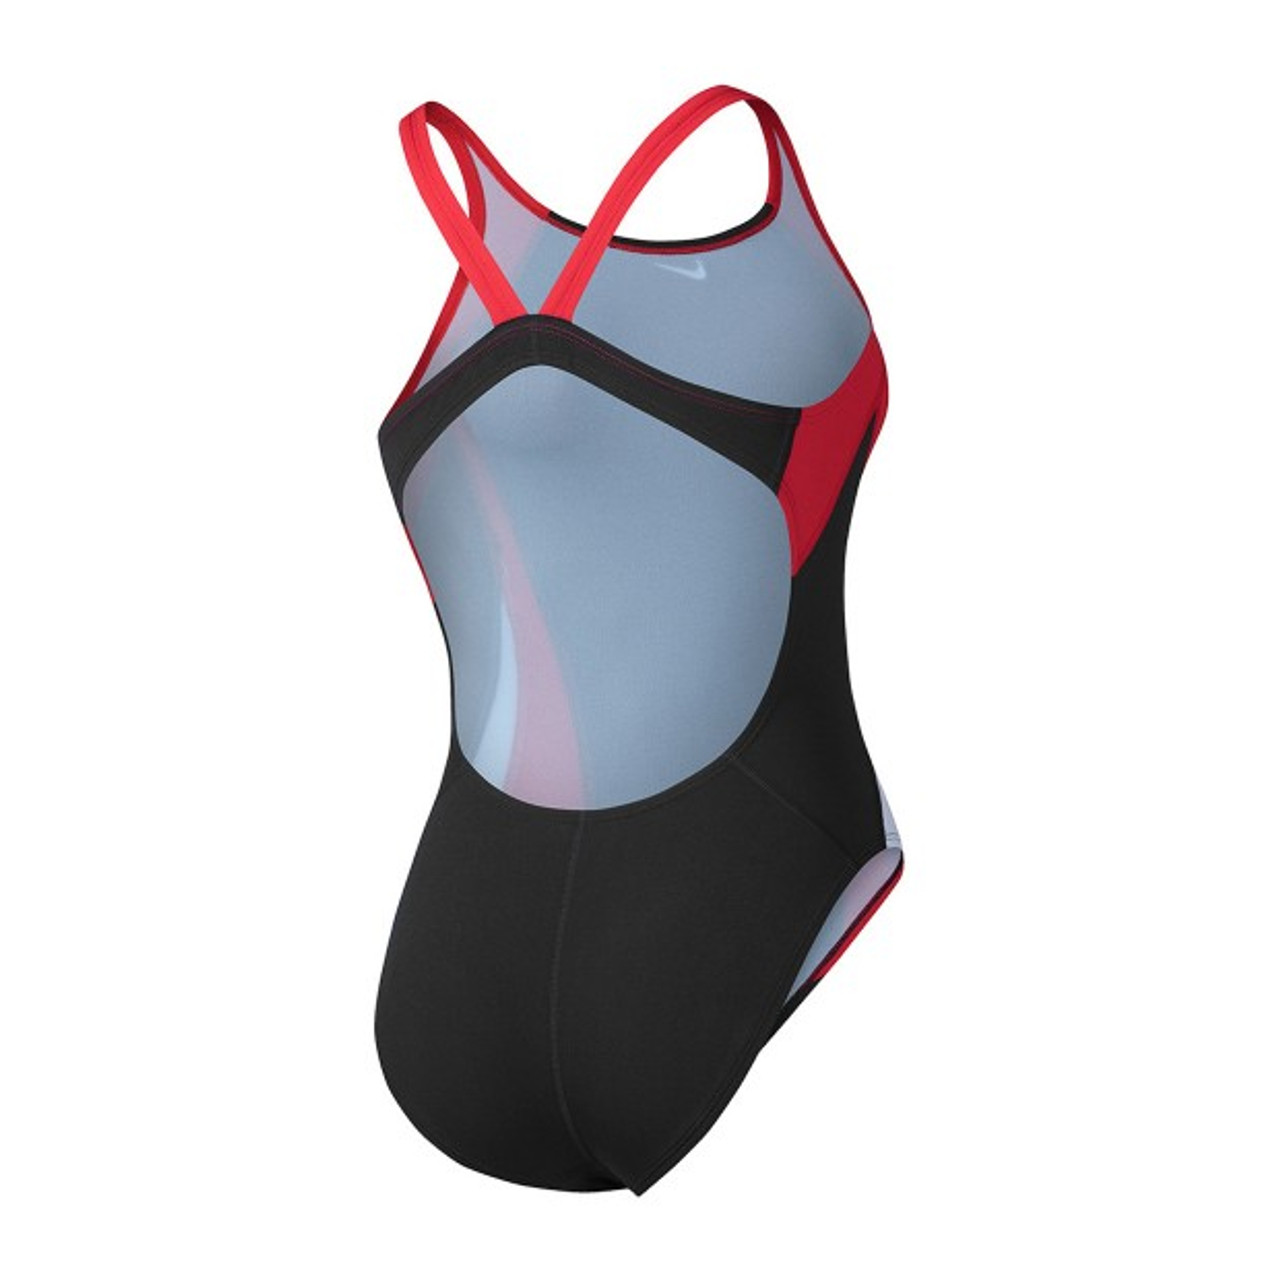 276a41226cf ... Nike Women's Poly Core Surge Fastback Tank Swimsuit - Back